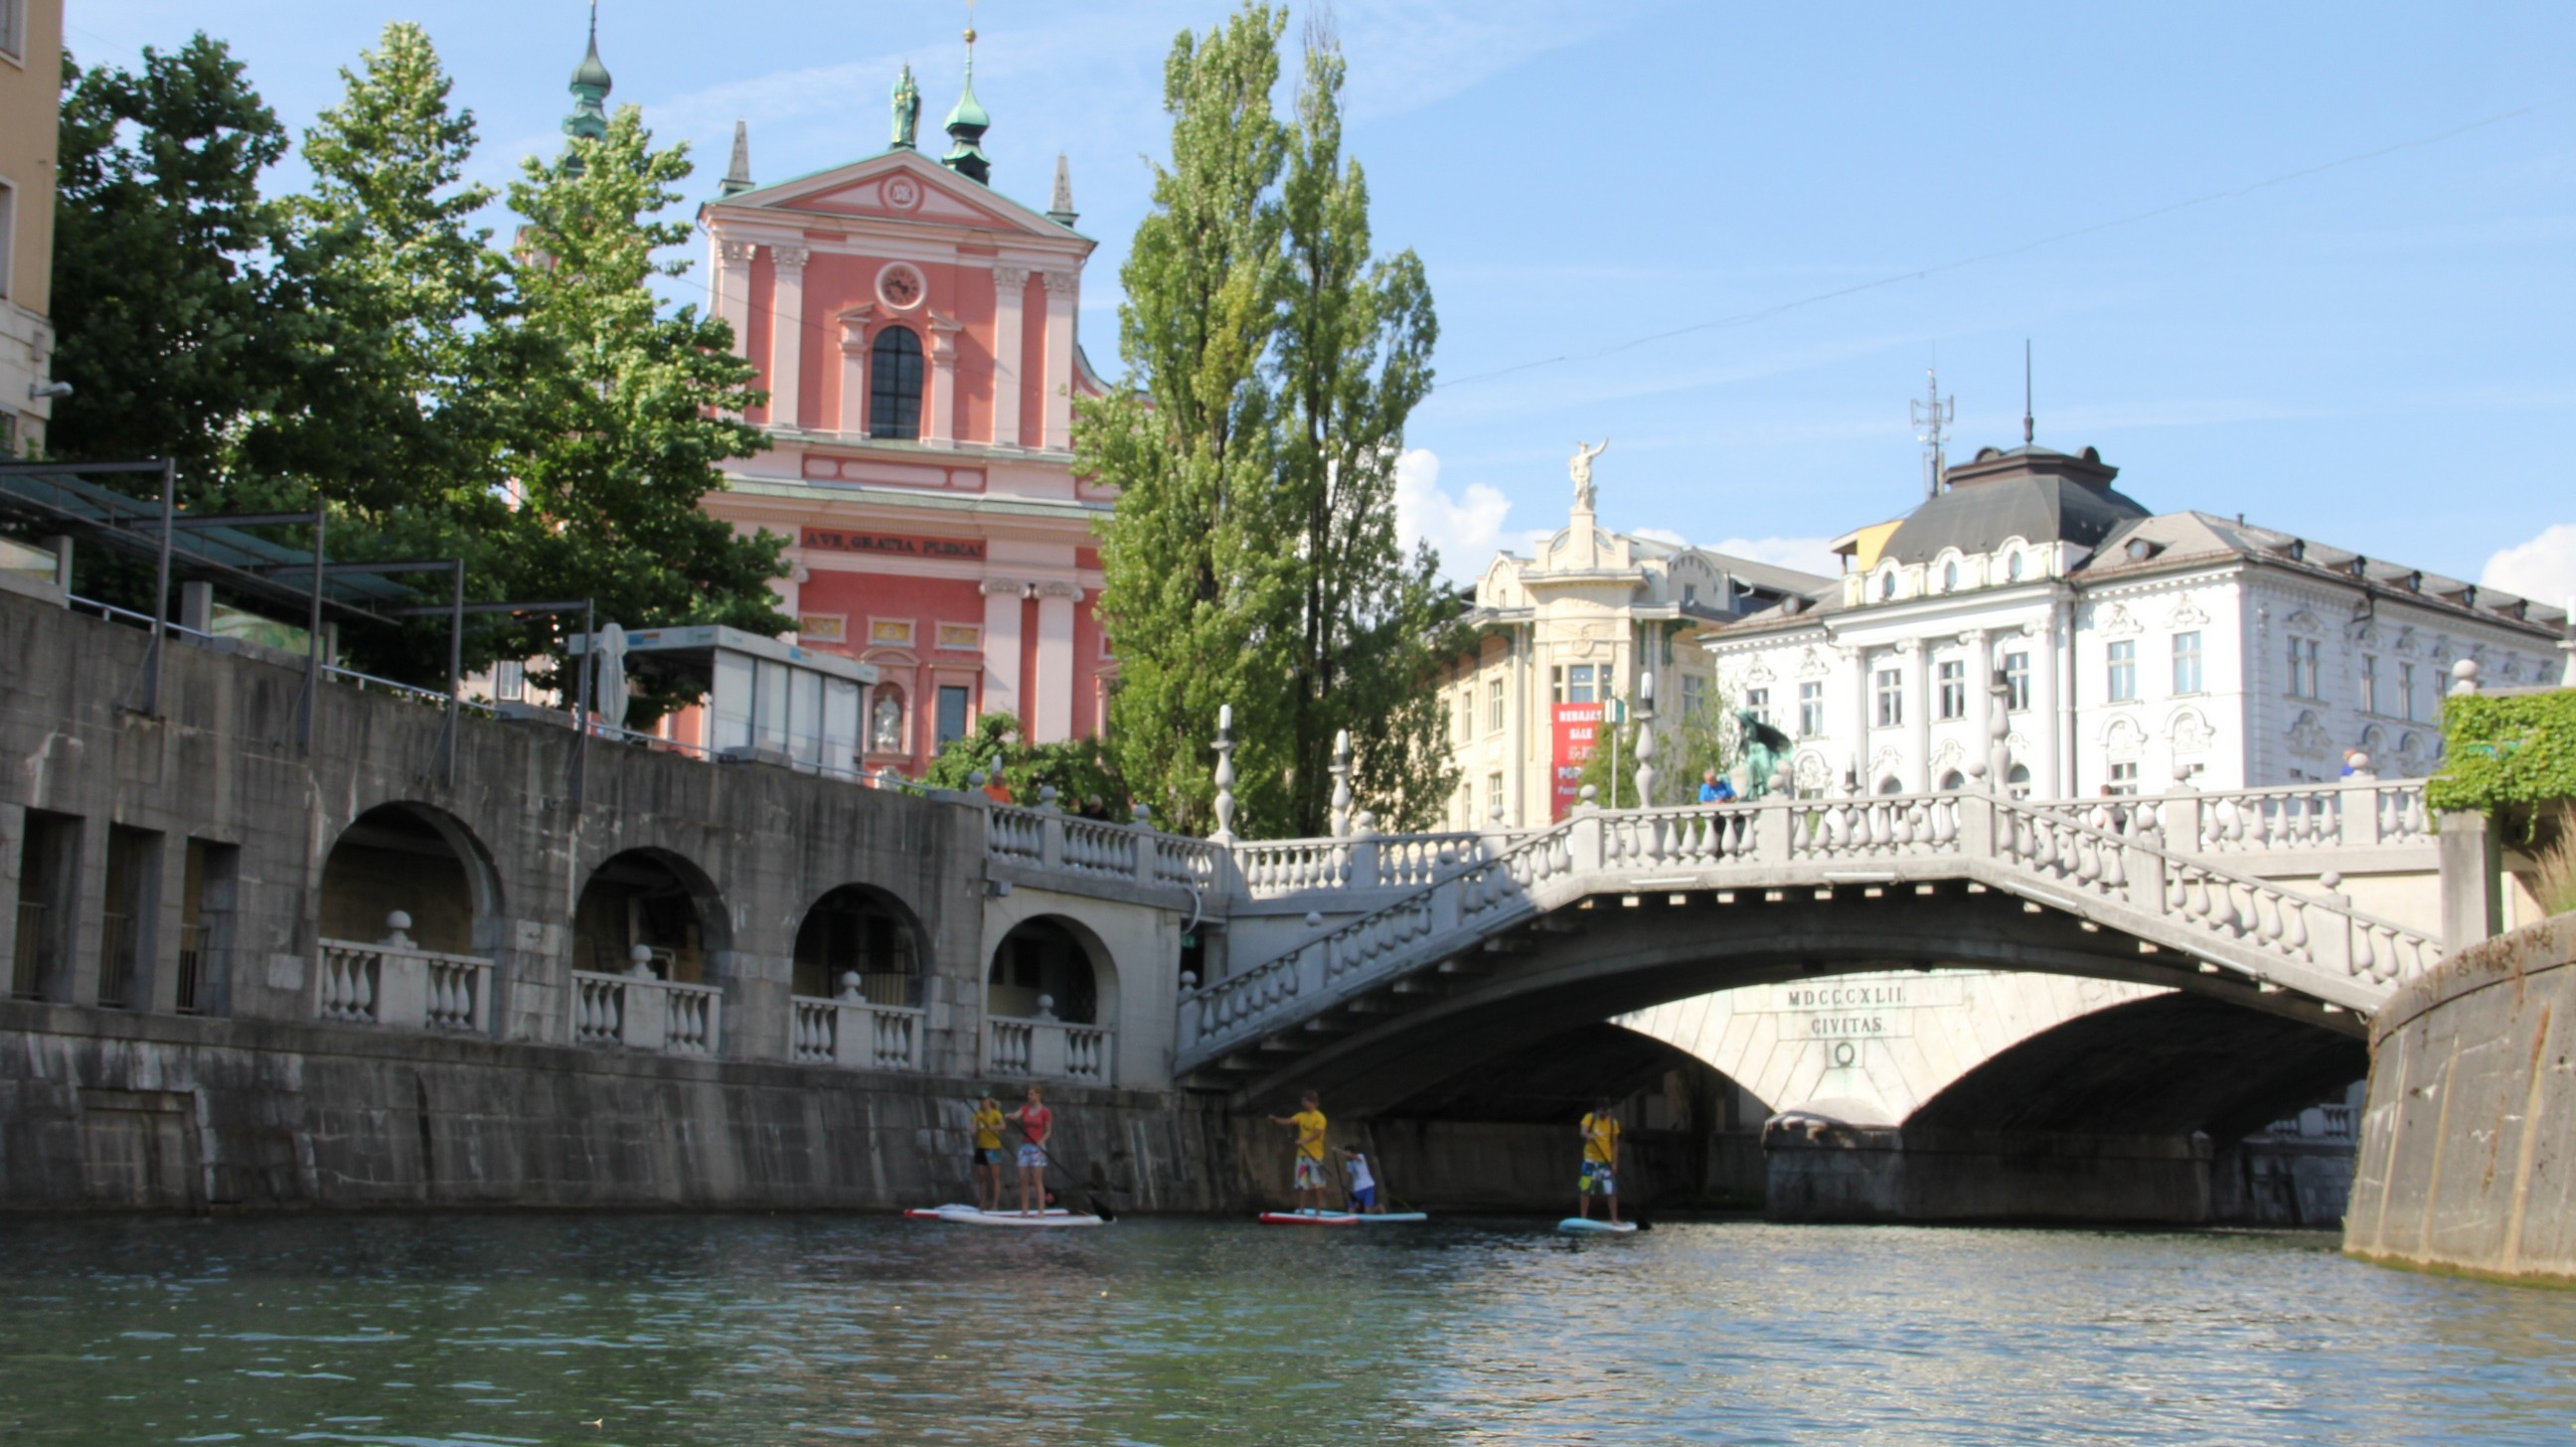 SUP Ljubljana city, Ljubljanica river